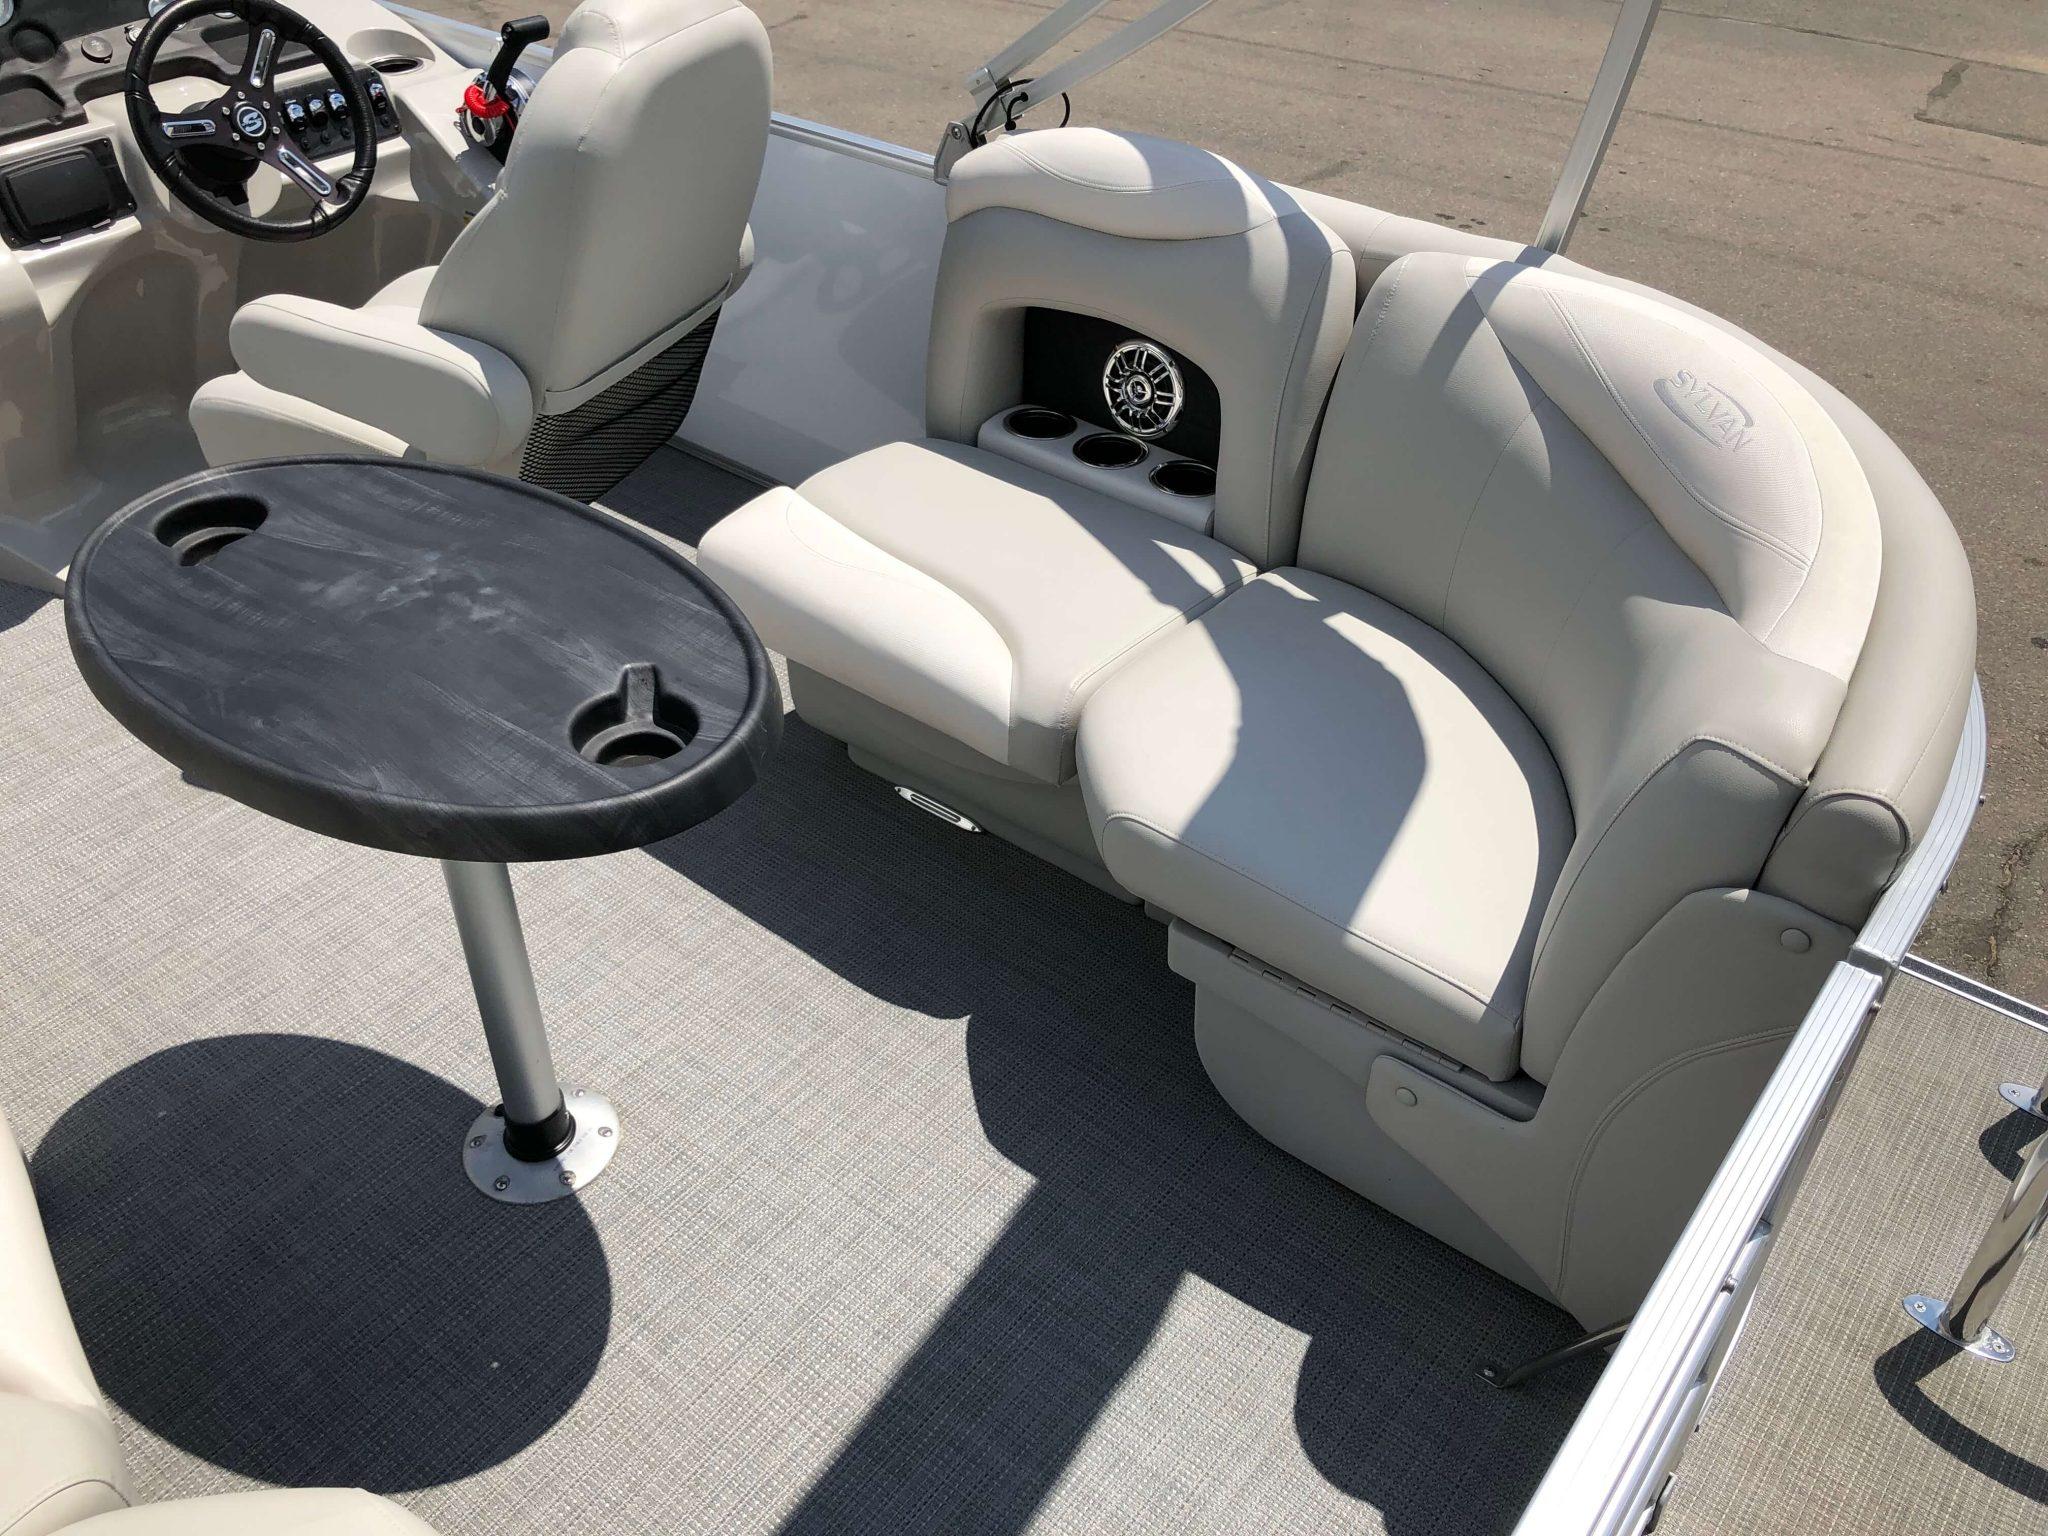 2016 Sylvan 8520 LZ LES Pontoon Boat Seating 1